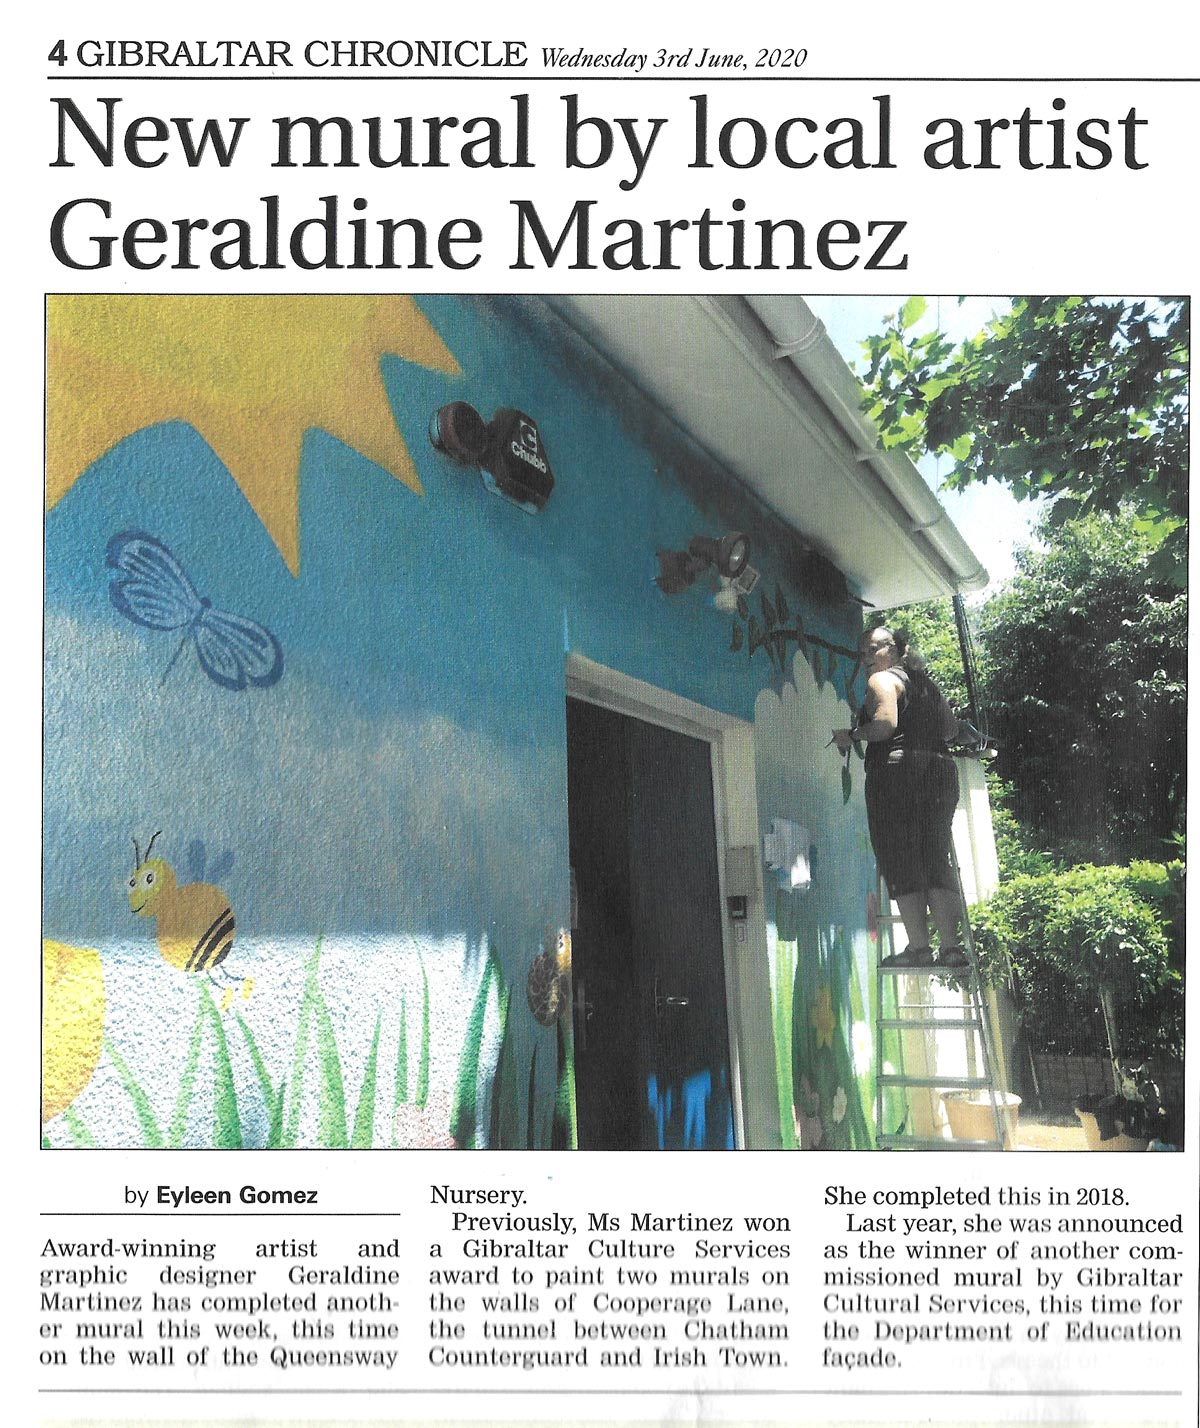 geraldine-martinez-nursery-mural-3-6-2020